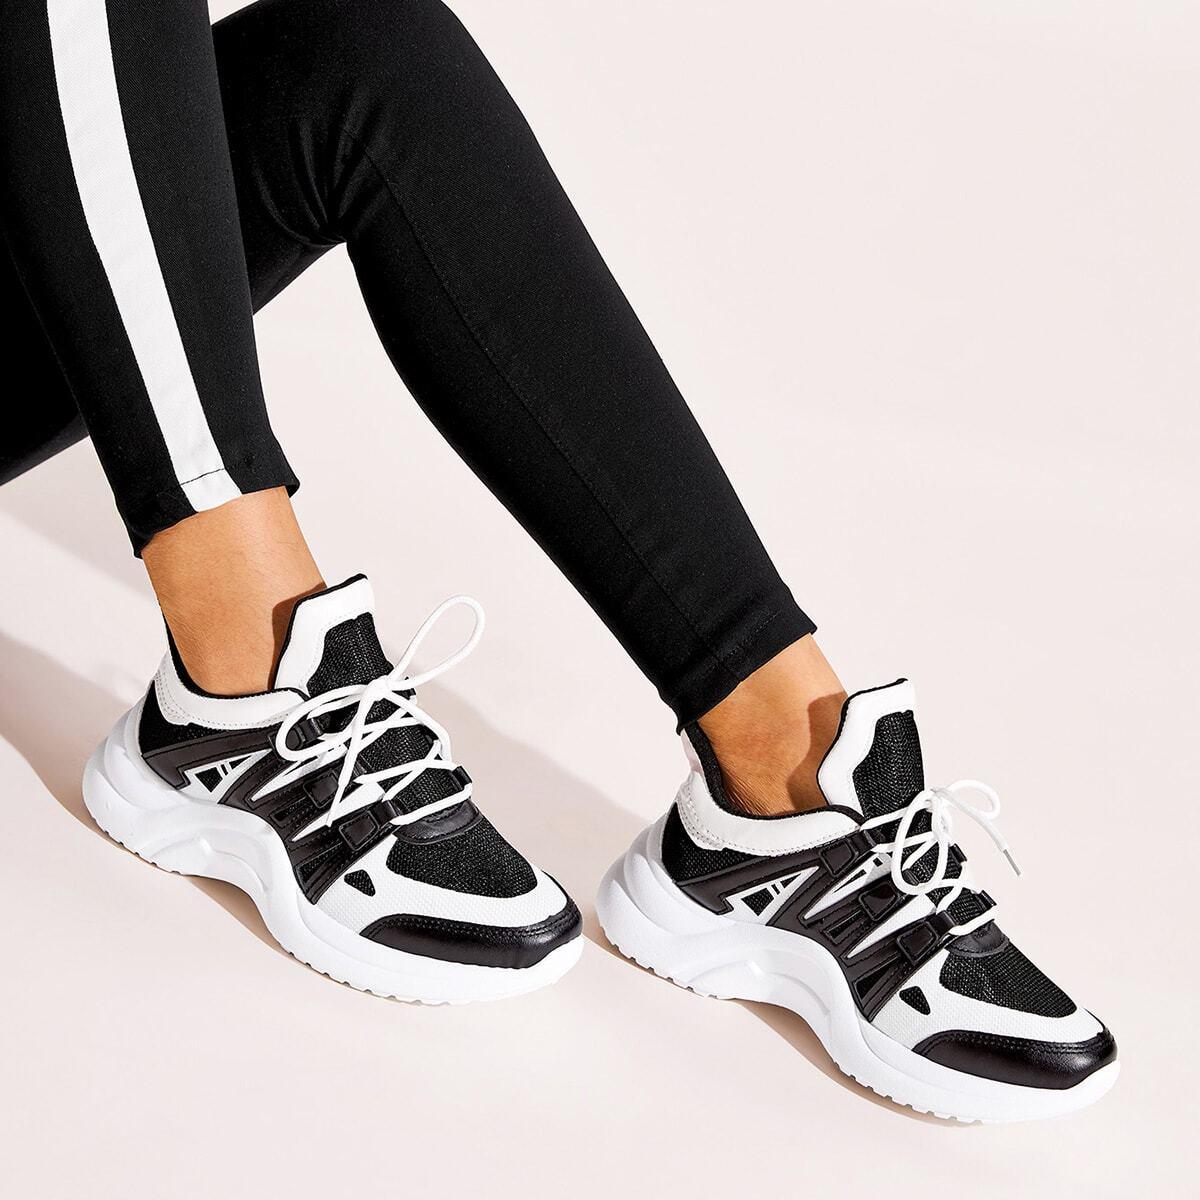 Colorblock Vetgevormde dikke sneakers